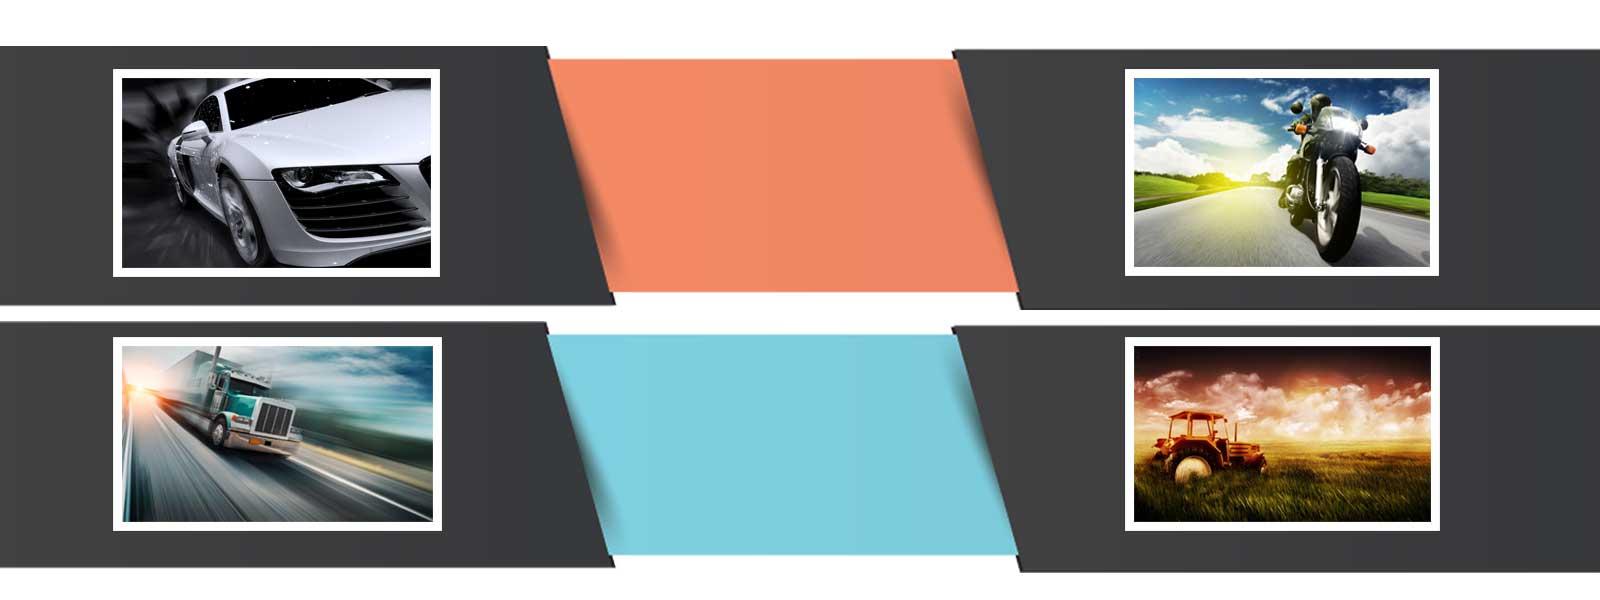 tentoglou-products-slide